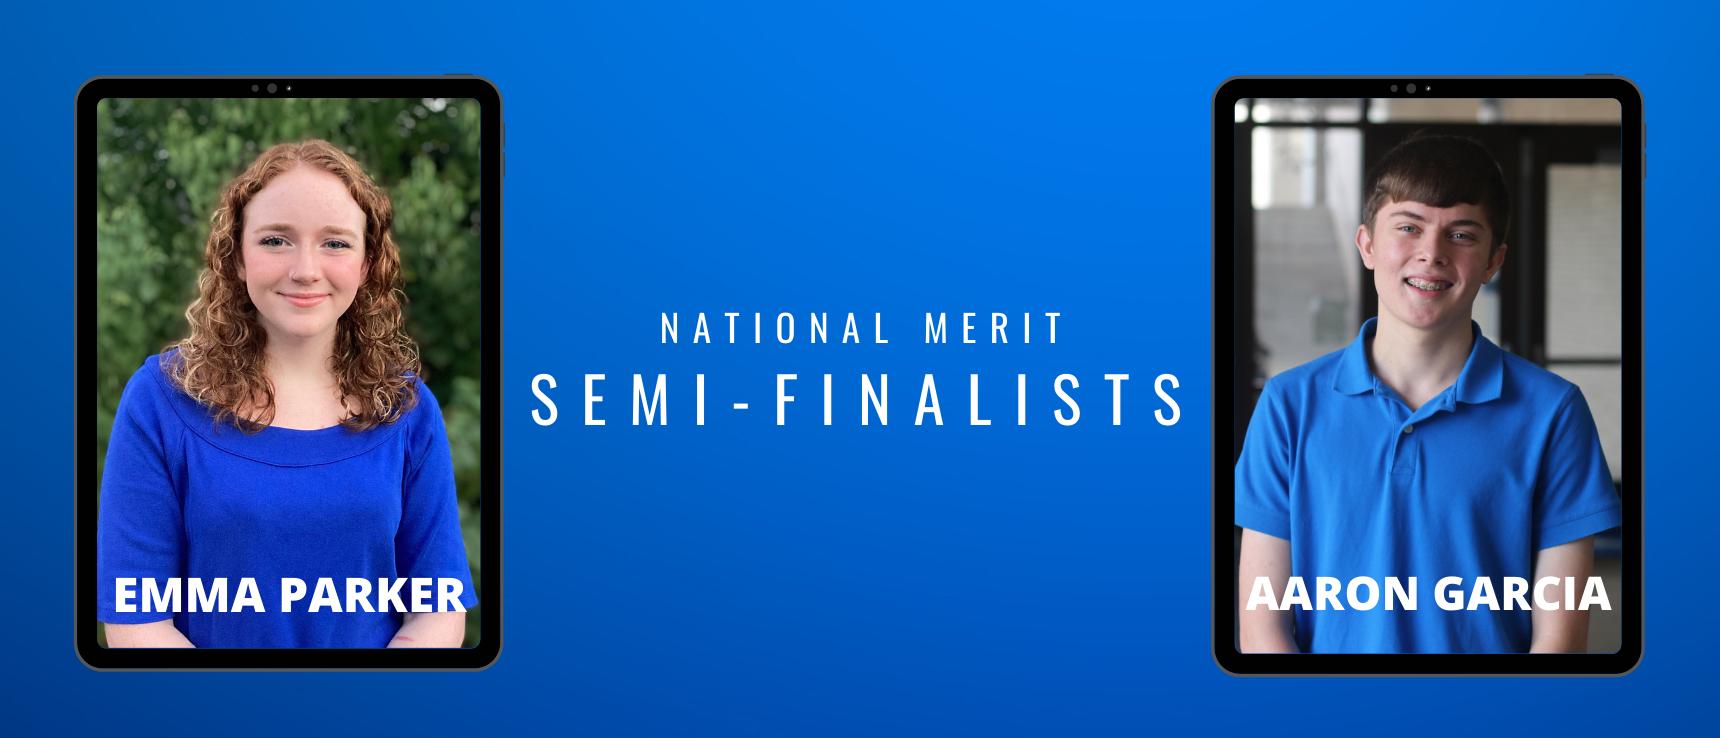 semifinalists national merit